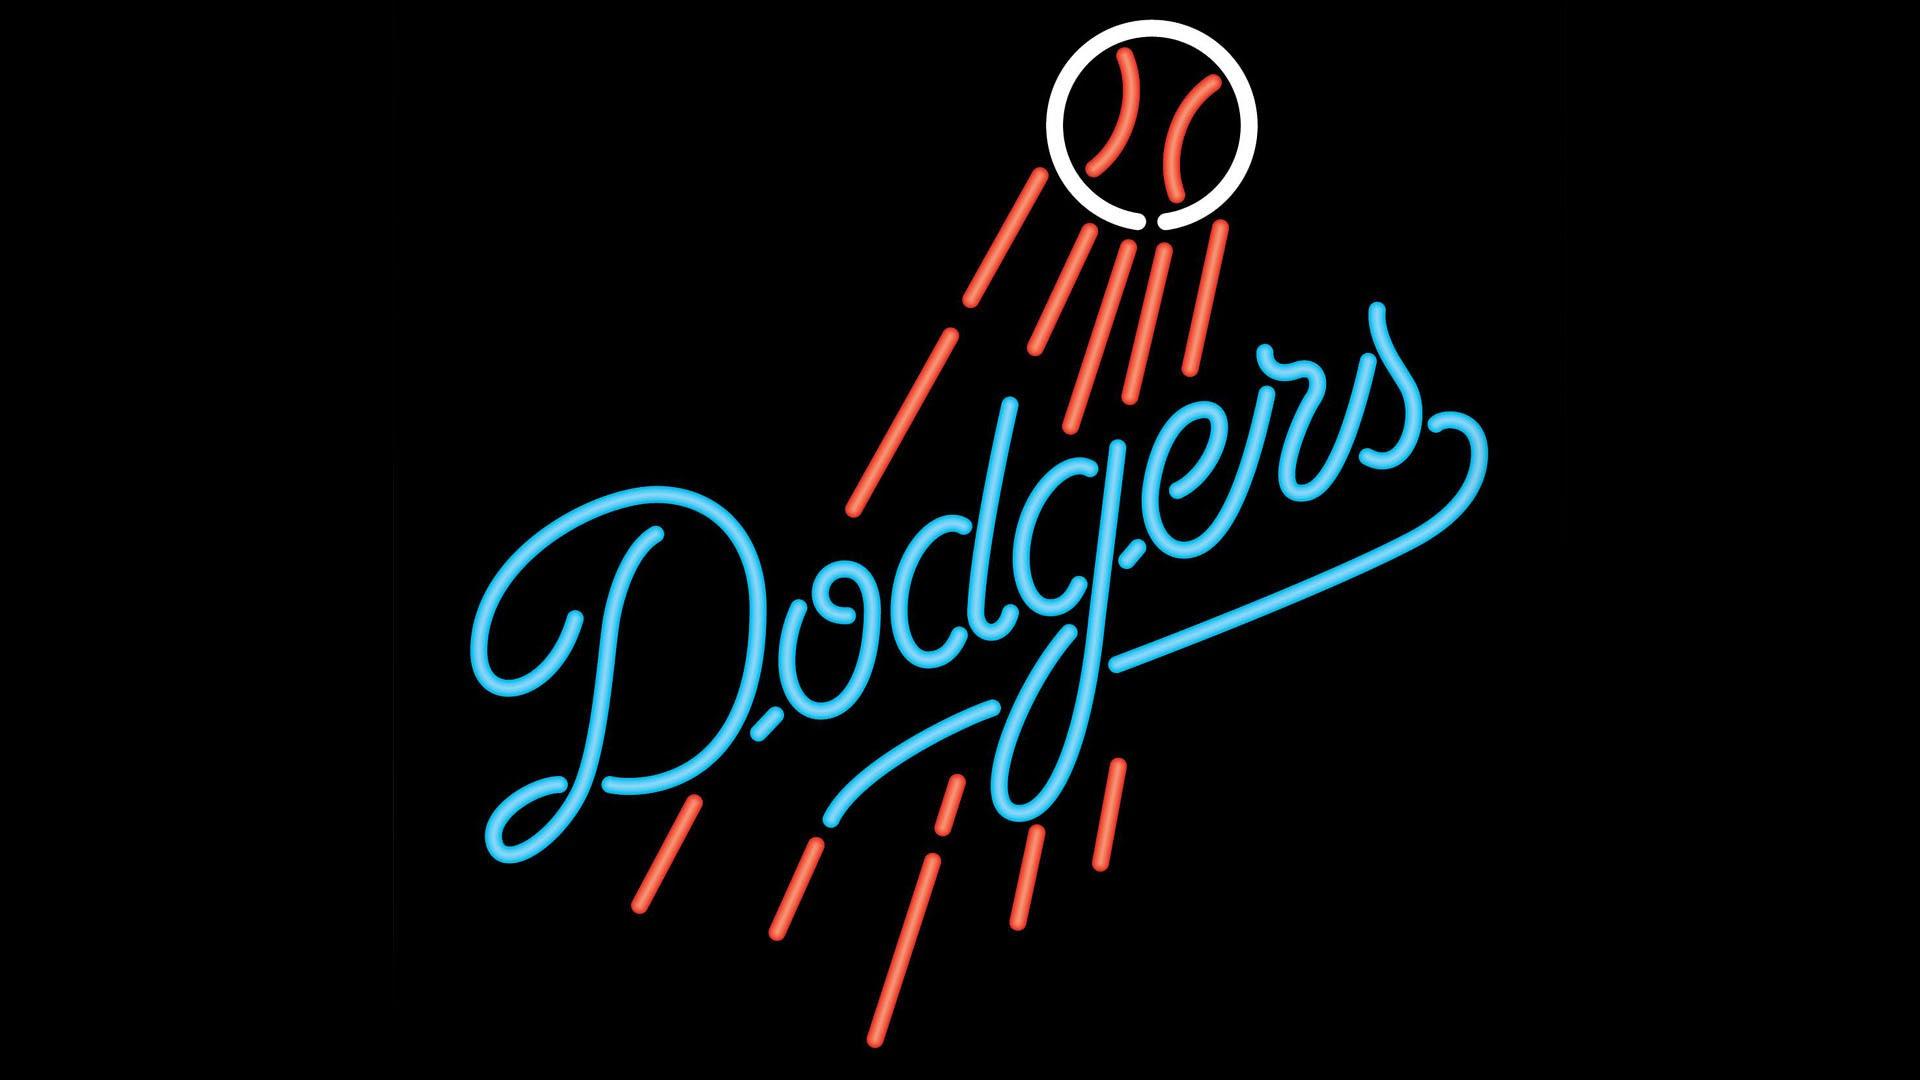 Los Angeles Dodgers Hd Desktop Wallpapers 32449 Baltana